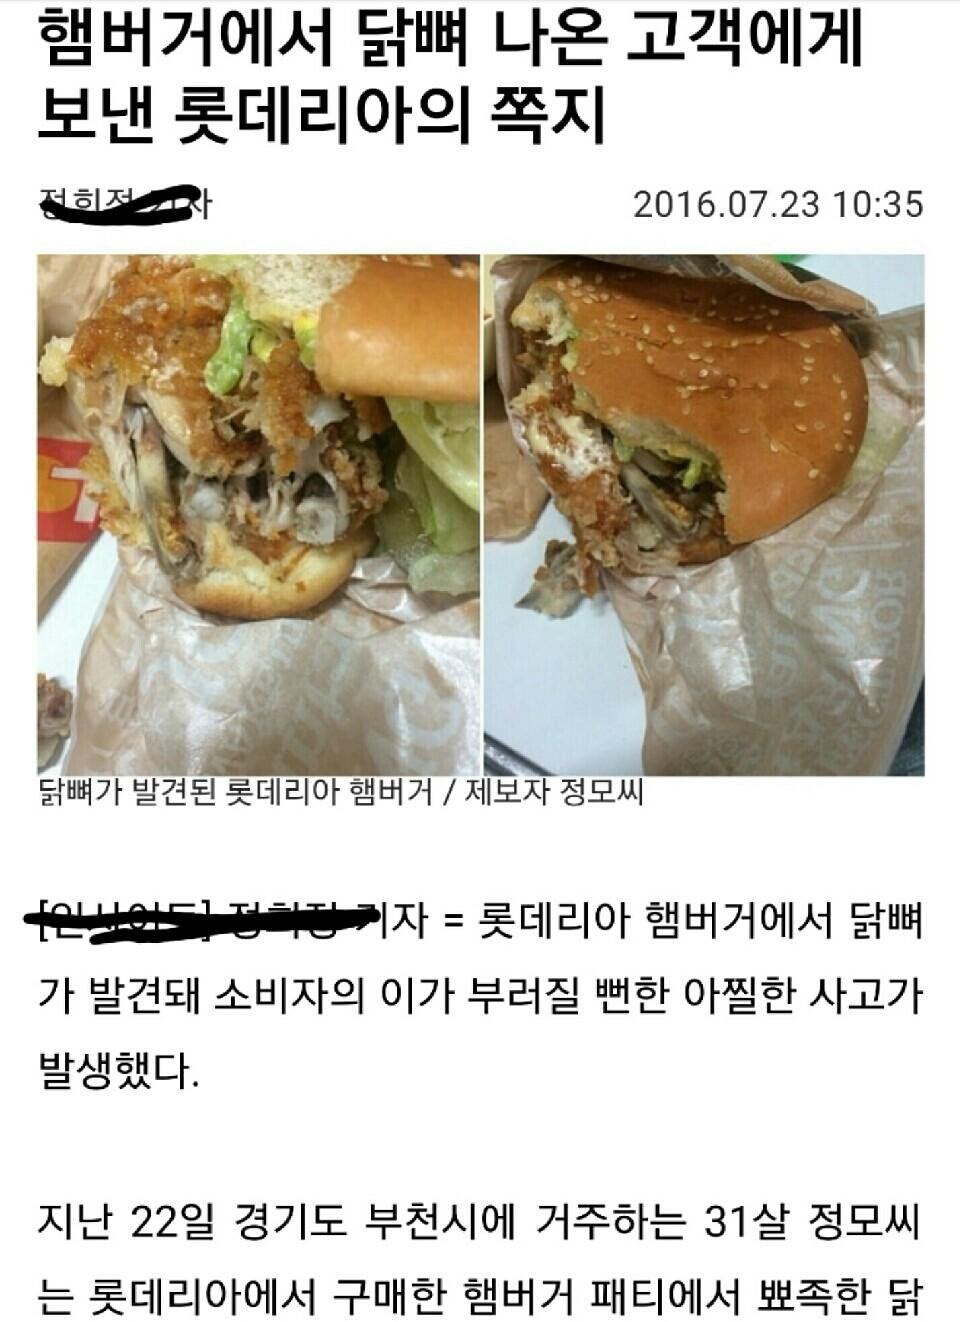 15b3c5bbf2018ffd4.jpg 햄버거에 닭뼈나온 롯데리아 답변.jpg